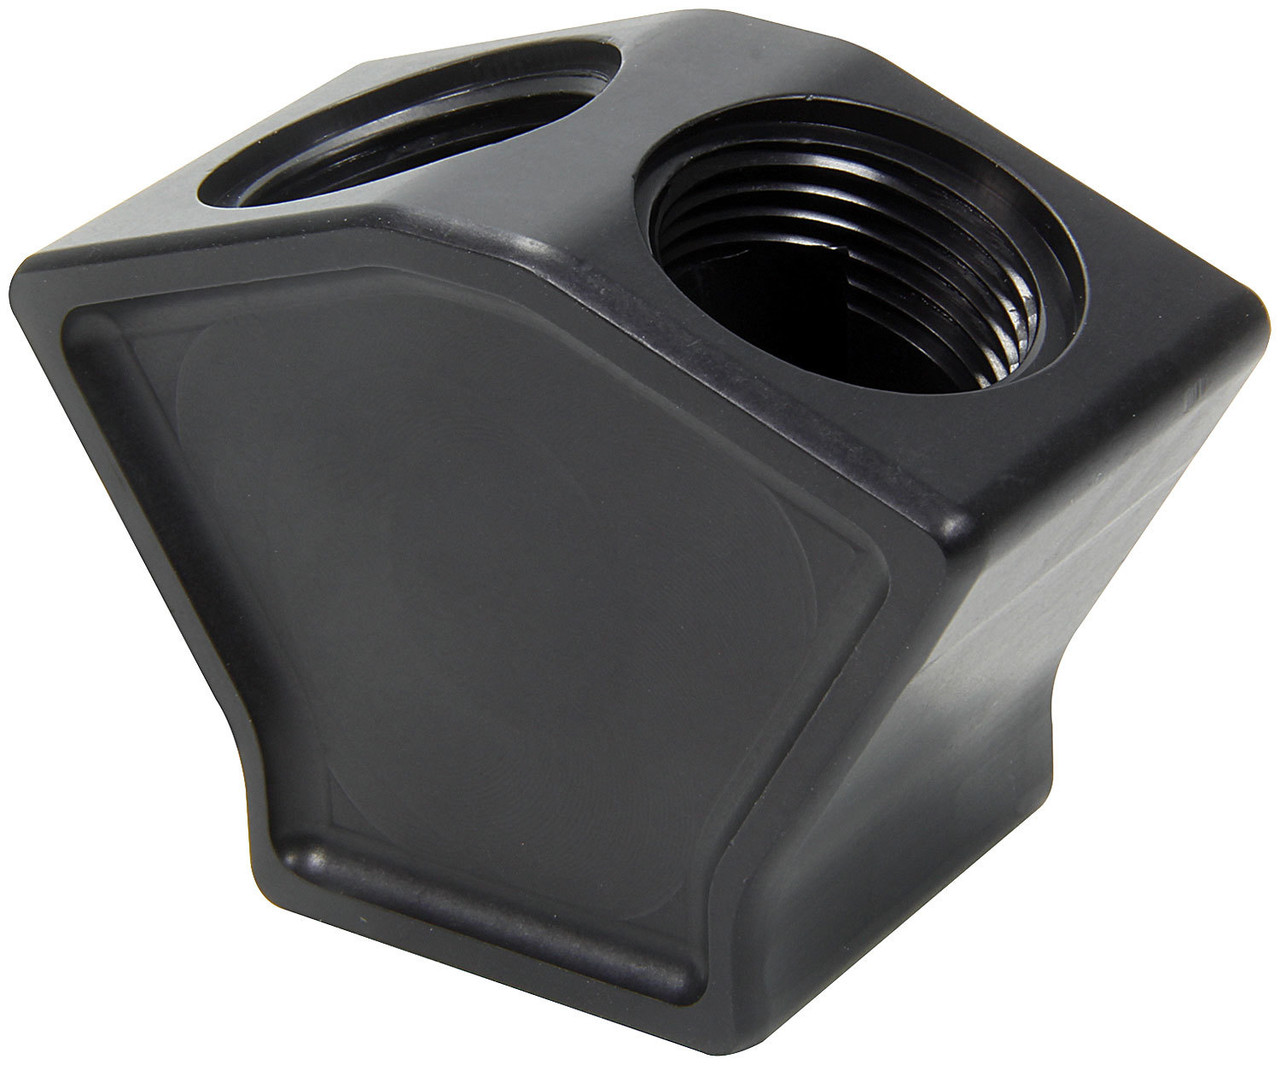 Heater Square Bulkhead Kit 3 10AN and 1 6AN ZIRZFACA2 kit cooling 4 Port AC